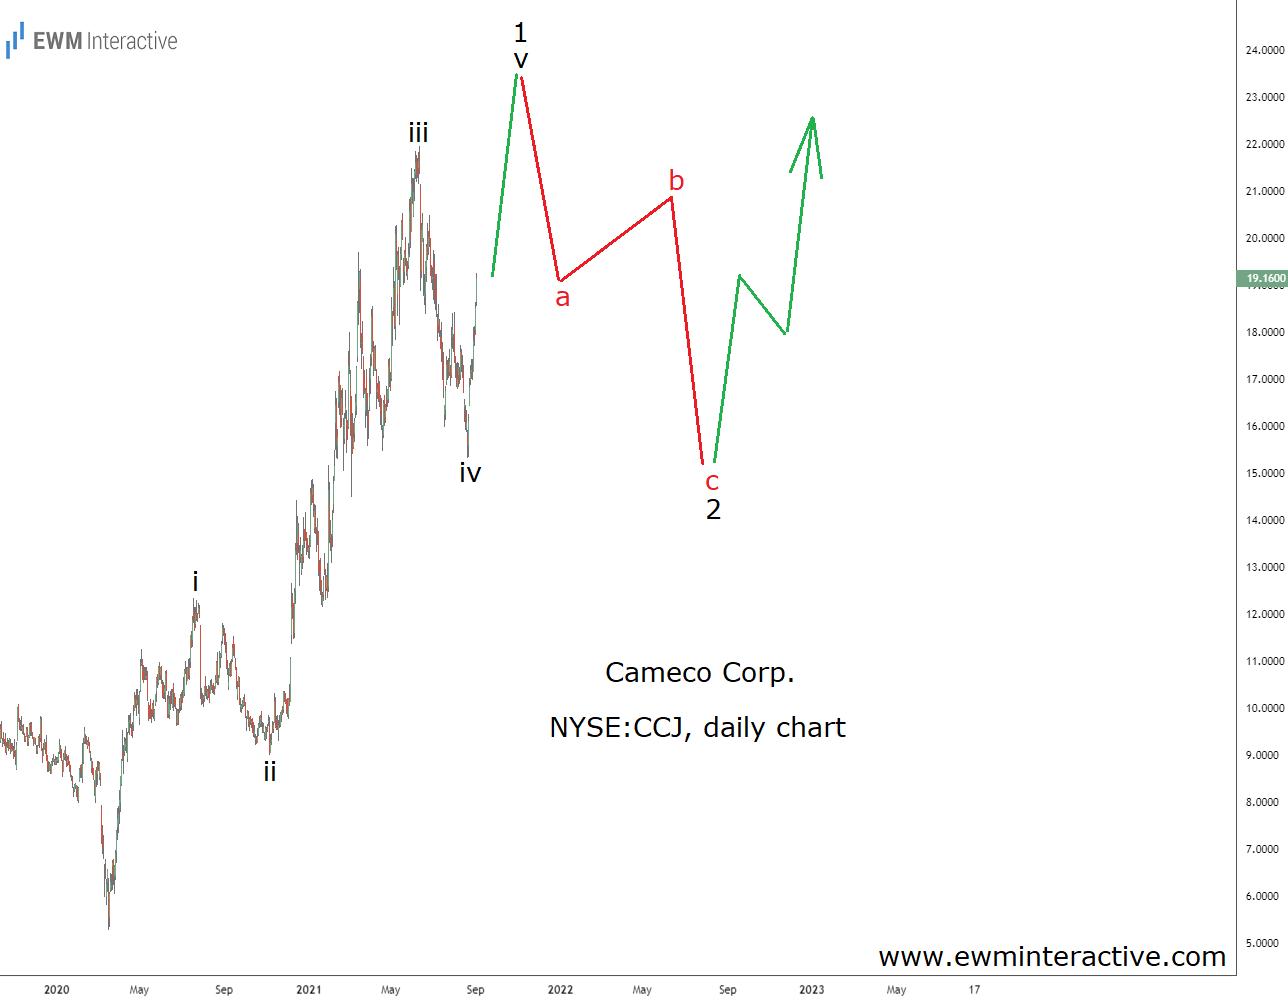 Cameco stock has finally turned a corner